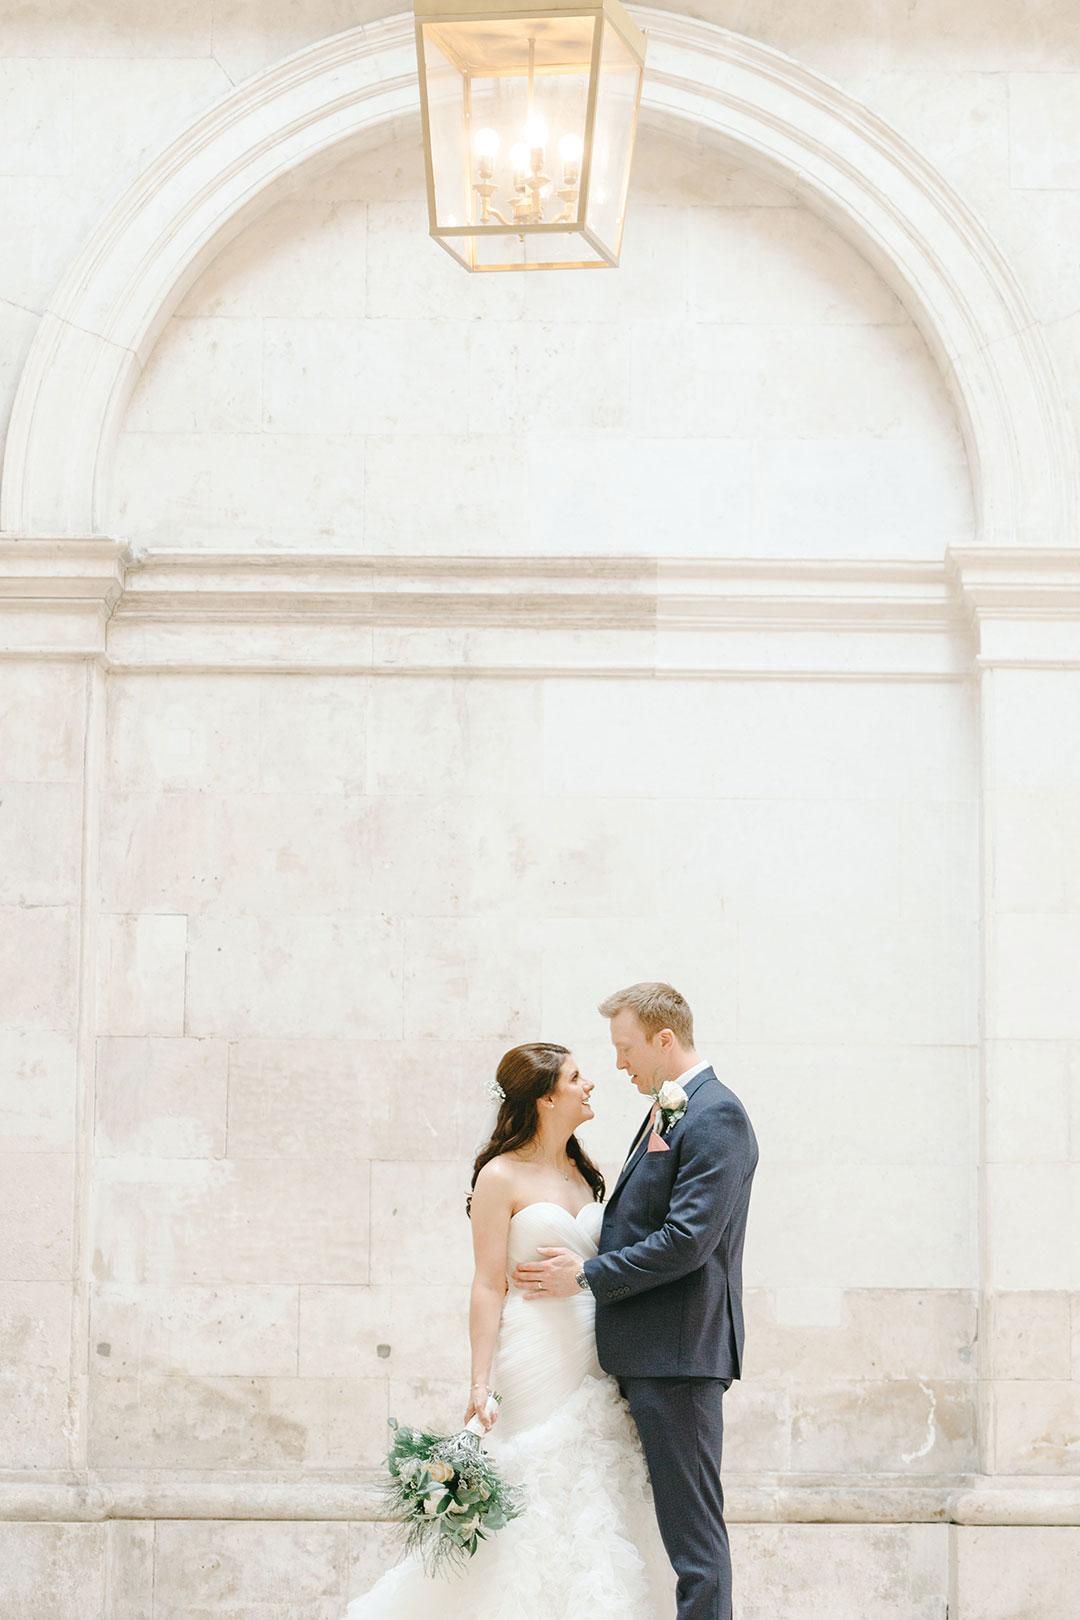 bellinter-house-wedding-photographer-0067_0067.jpg